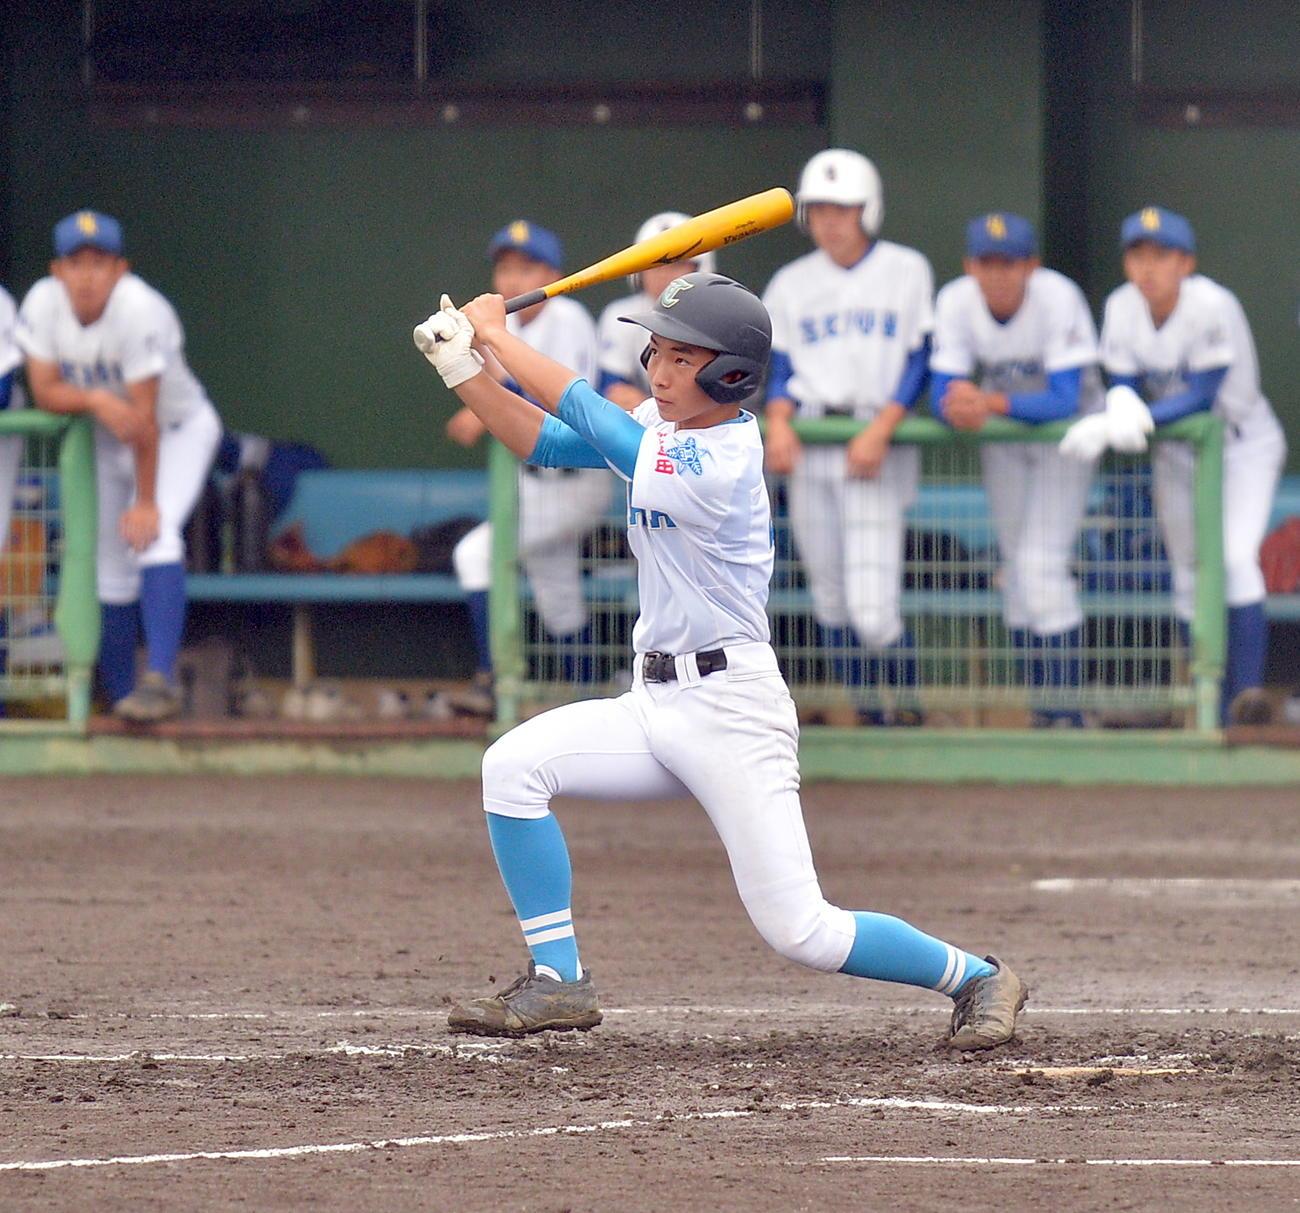 高田対花北青雲 1回表高田2死一、二塁、左中間に2点適時二塁打を放つ平沢(撮影・鎌田直秀)